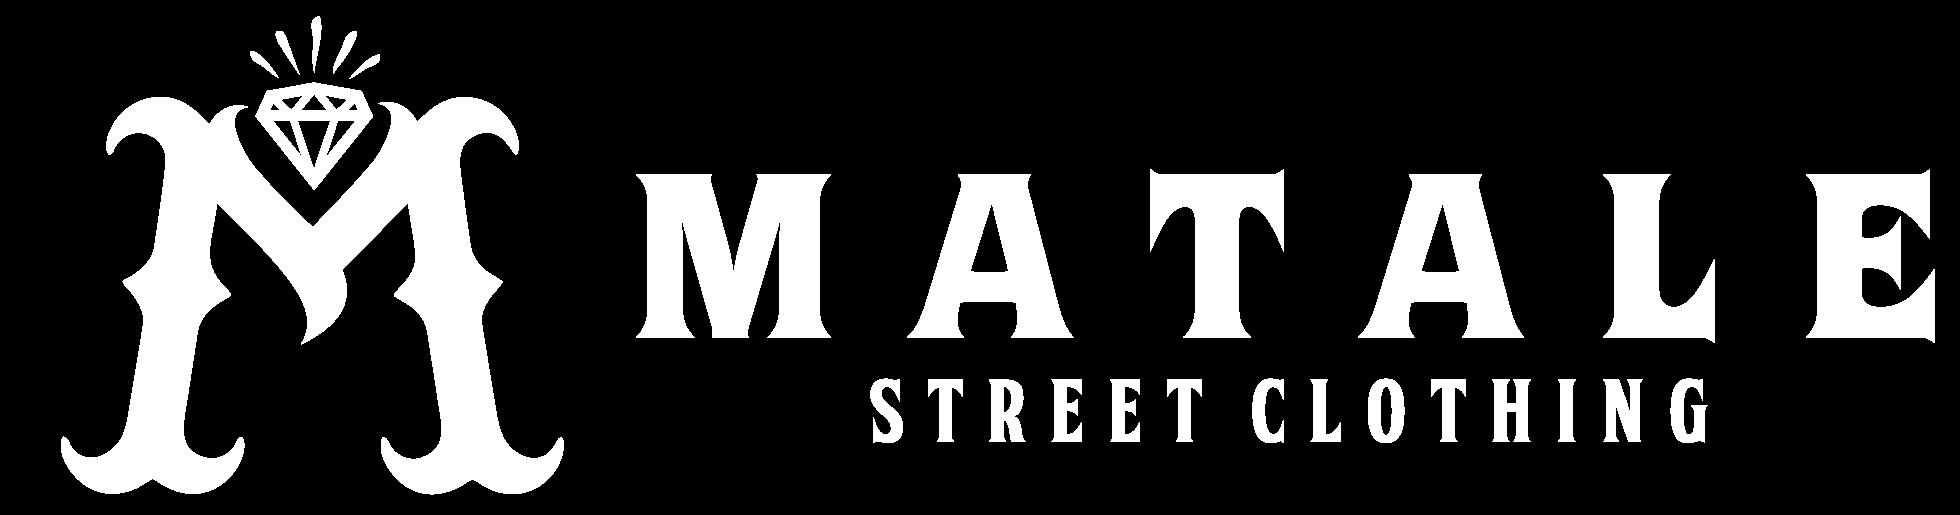 Mátale